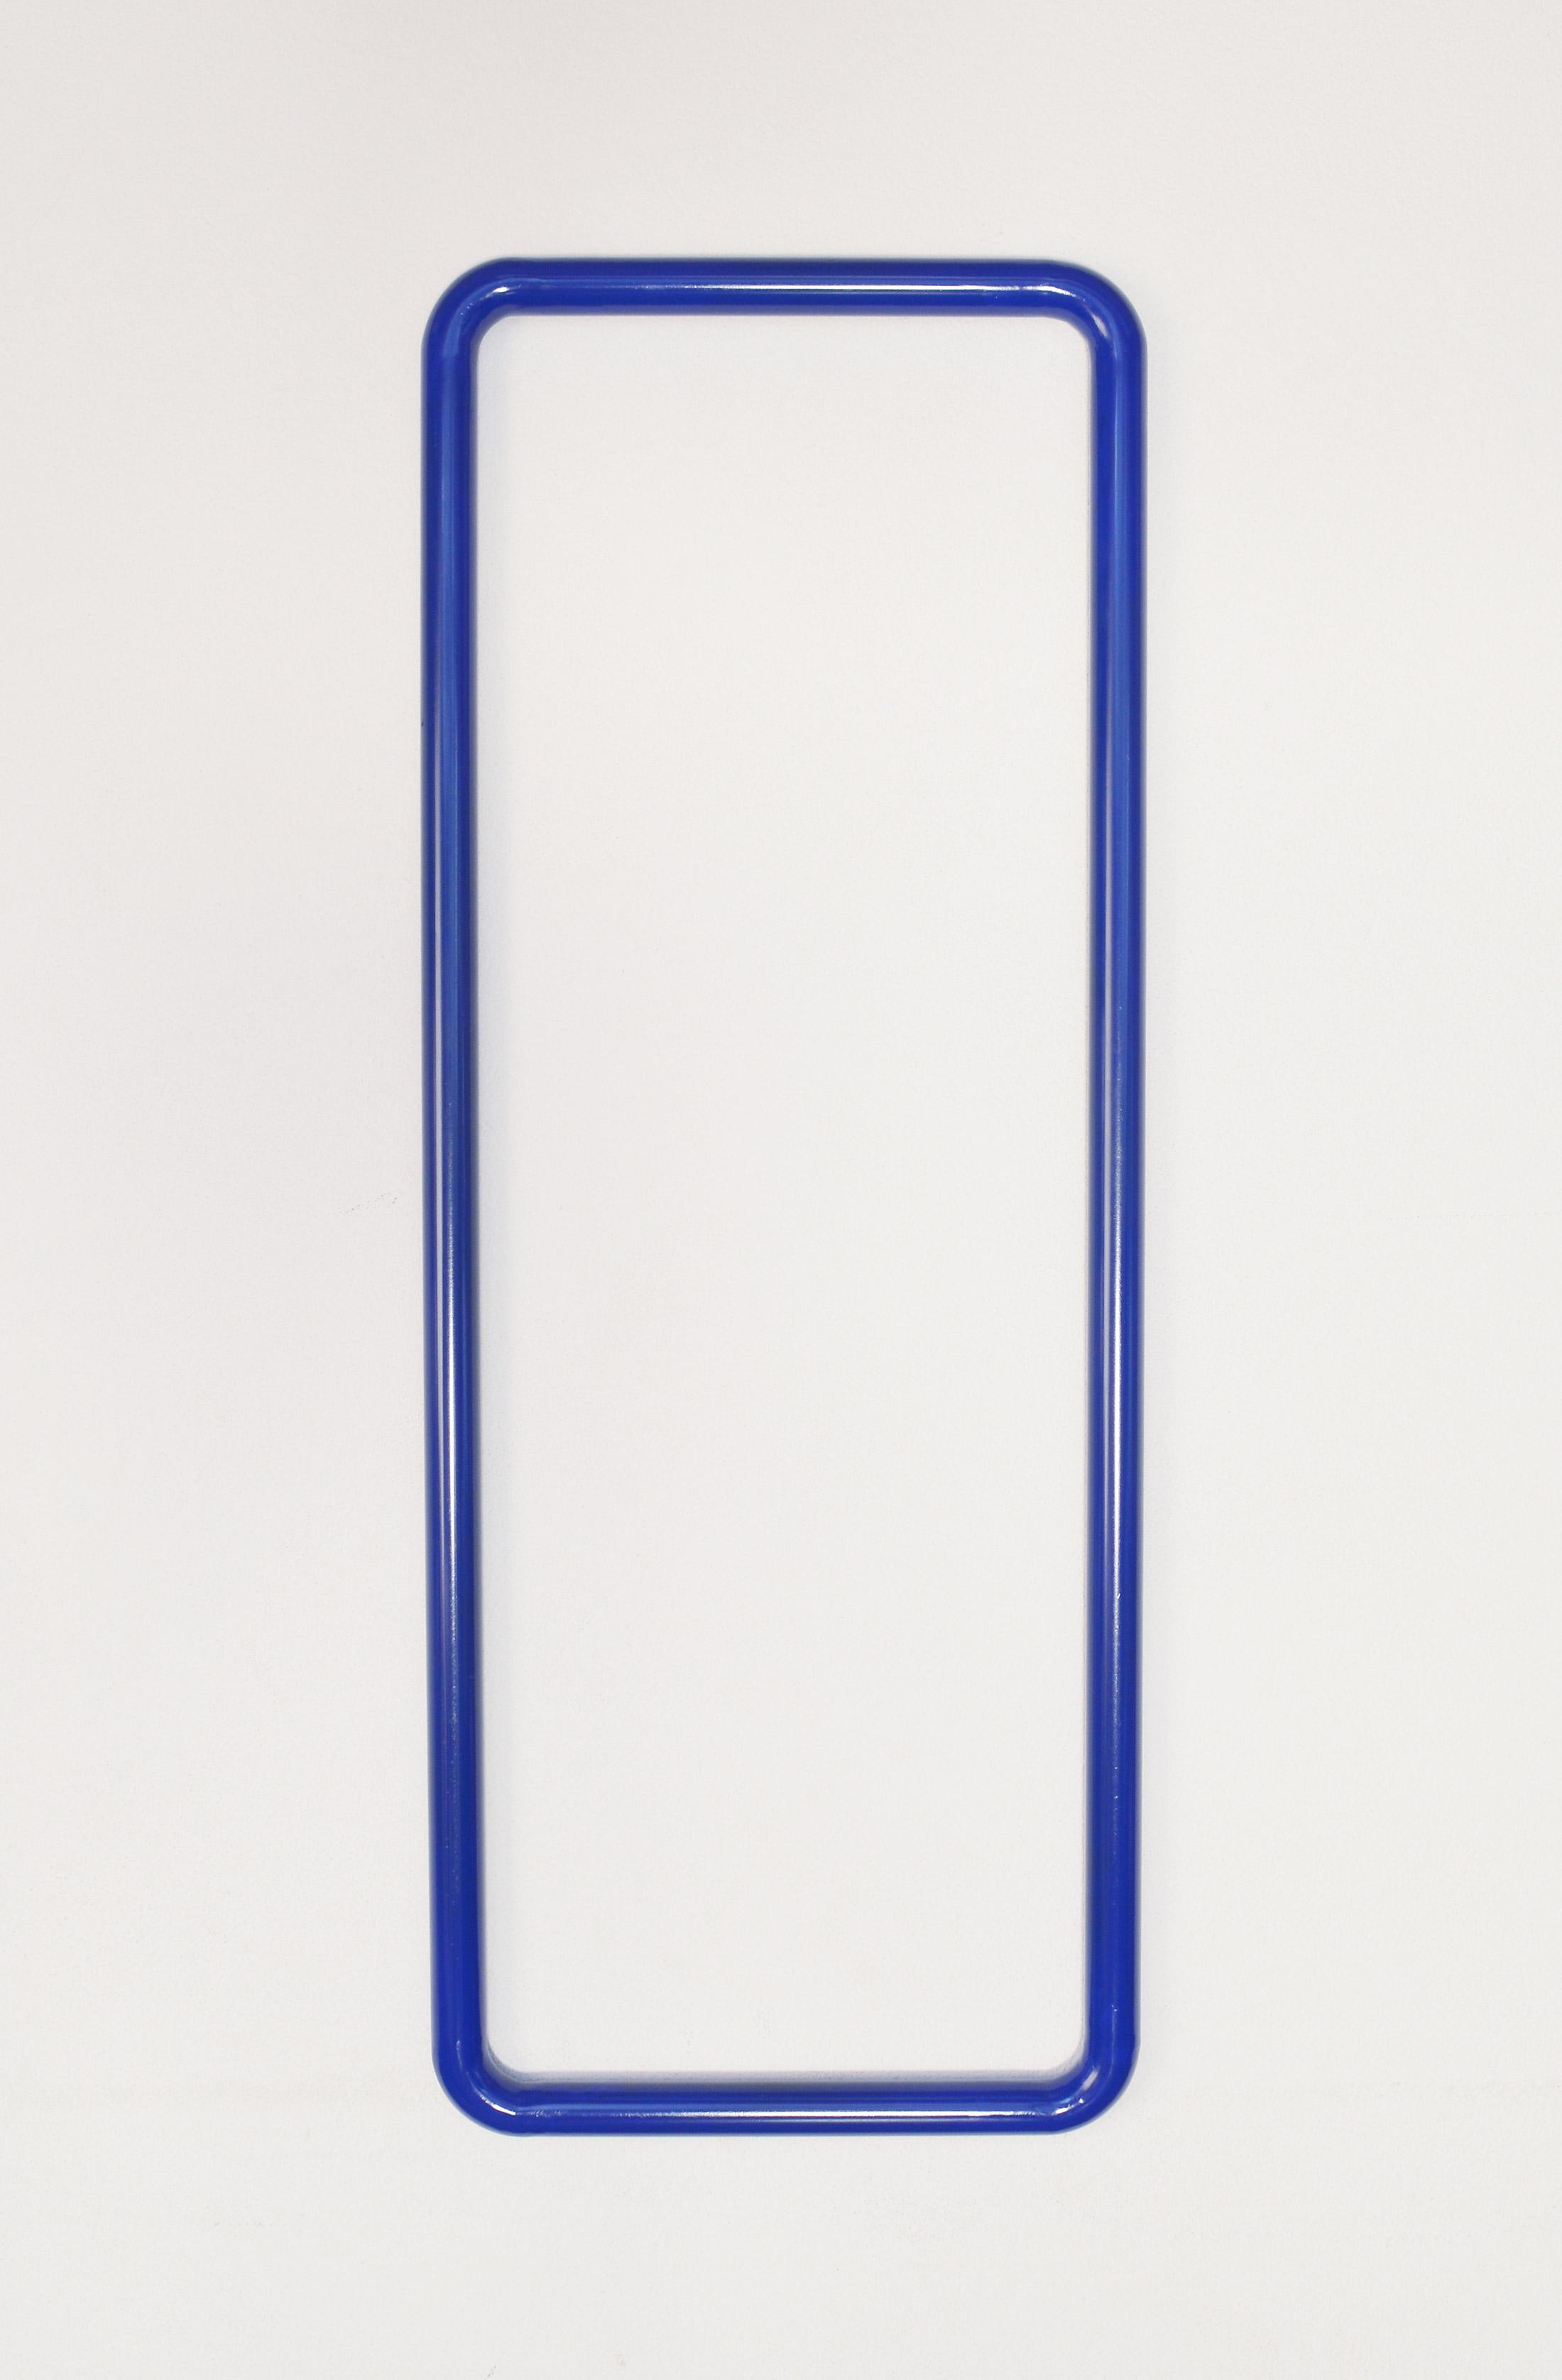 emanuel ehgartner, munchies art club, online viewing room, blue varnish on steel, sculpture, buy art online